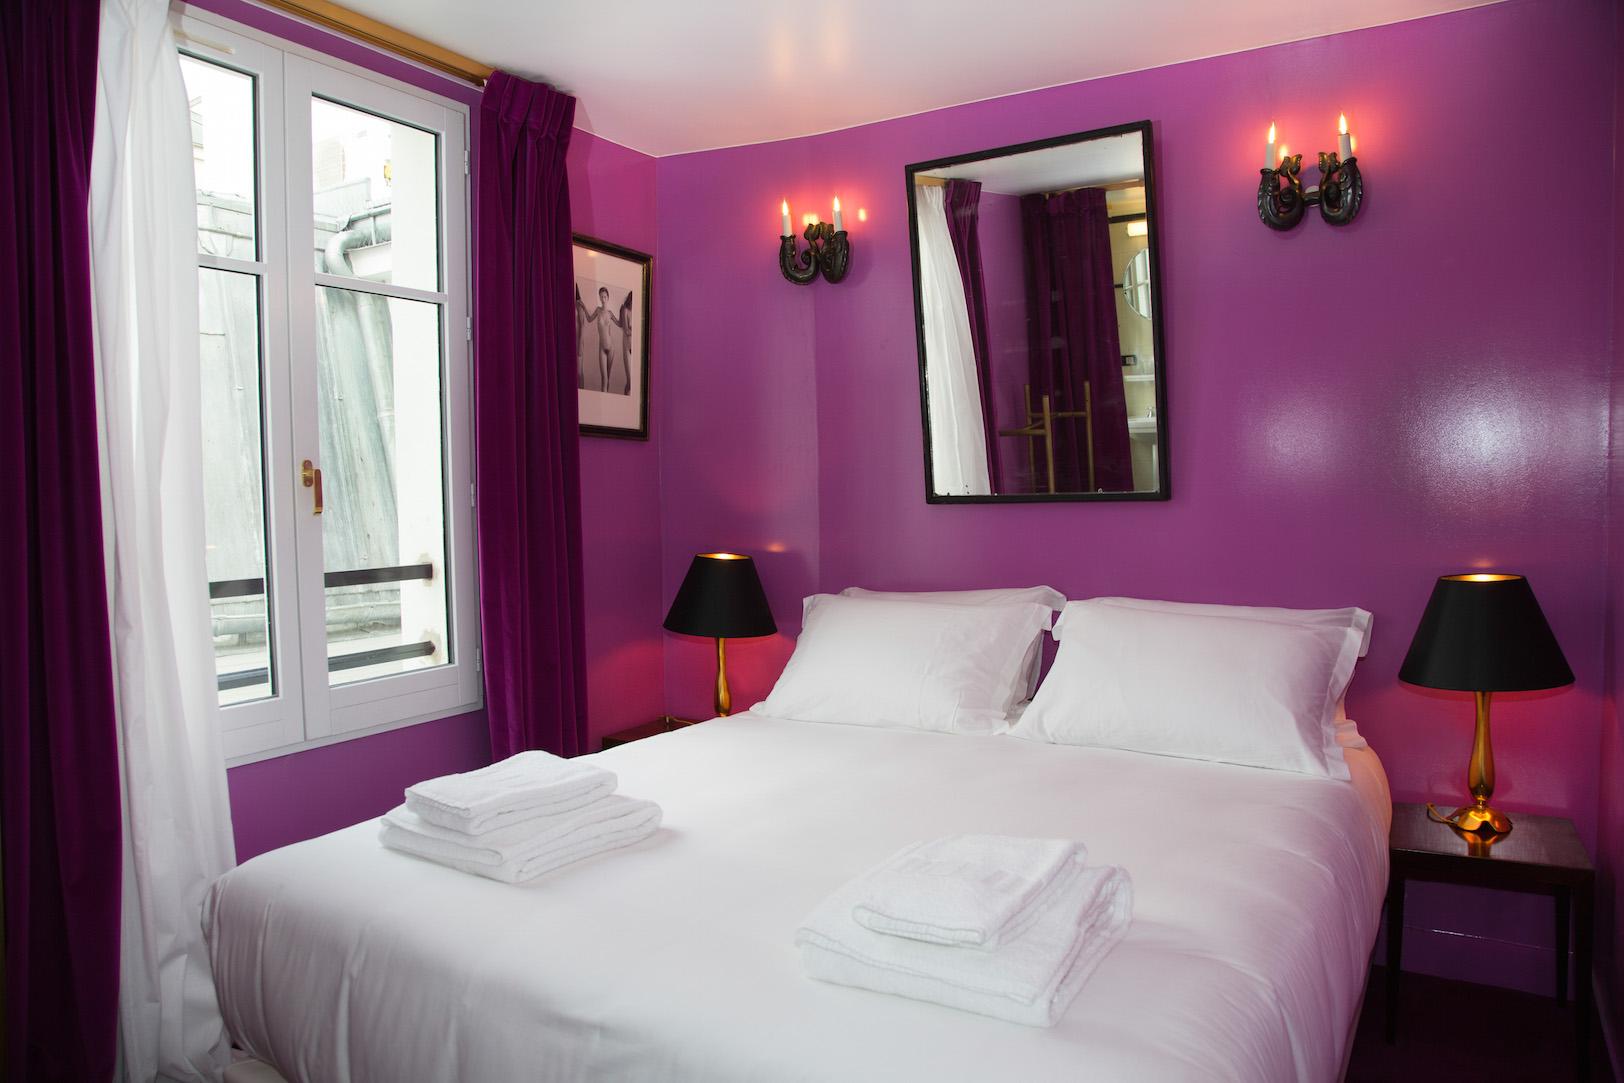 Le grand amour carton magazine - Hotel grand amour paris ...